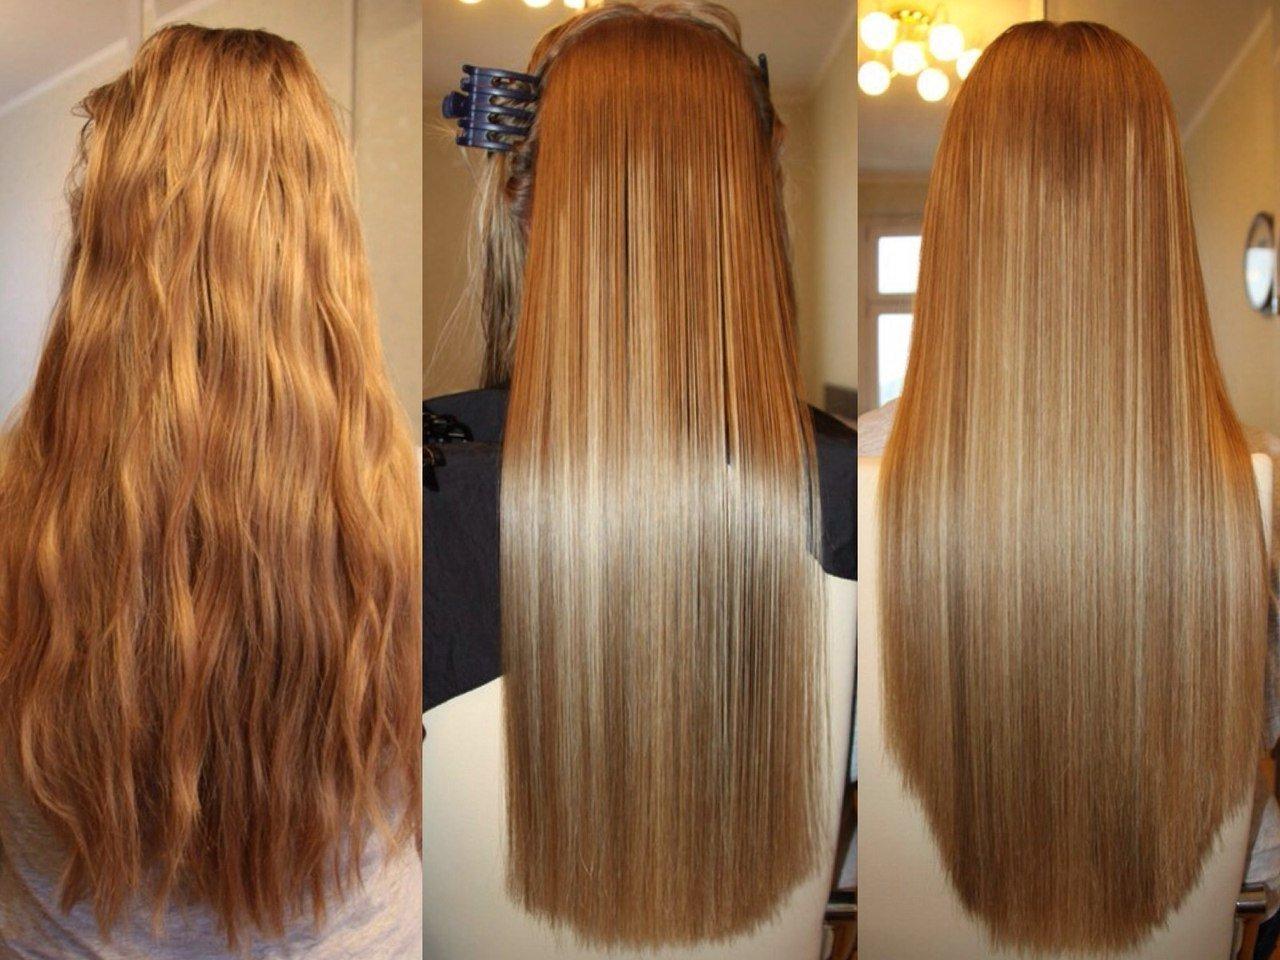 Уход за ламинированными волосами в домашних условиях